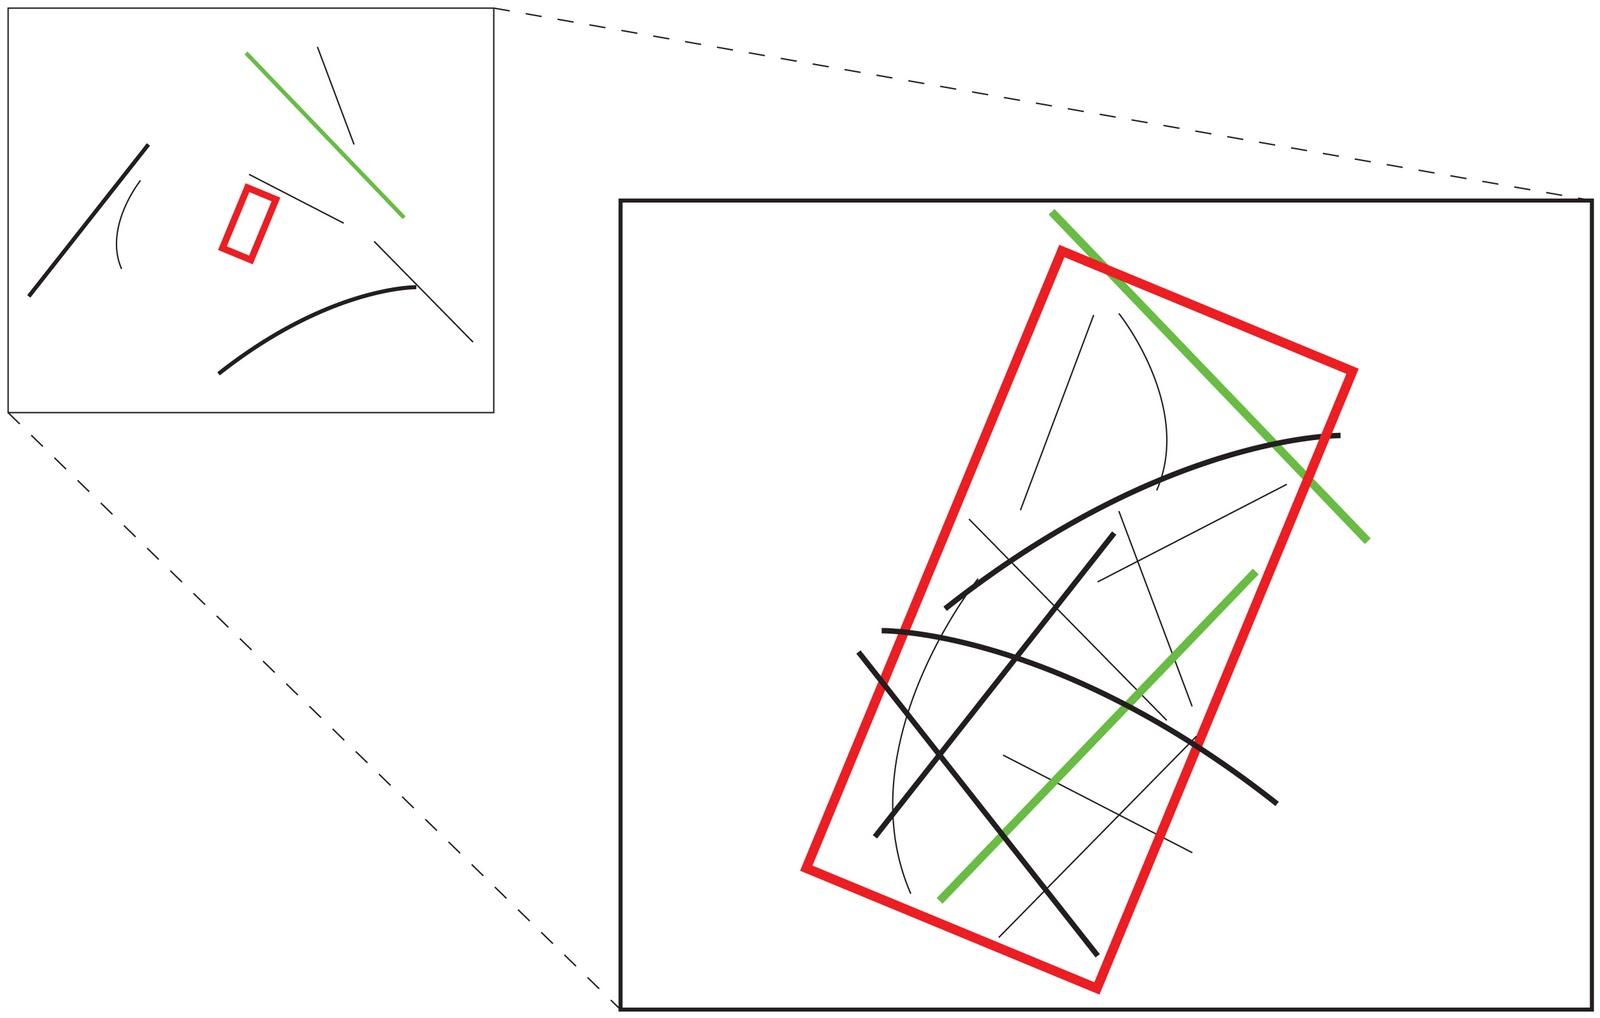 ARCH 3611 Fall 11 ESoltan: November 2011